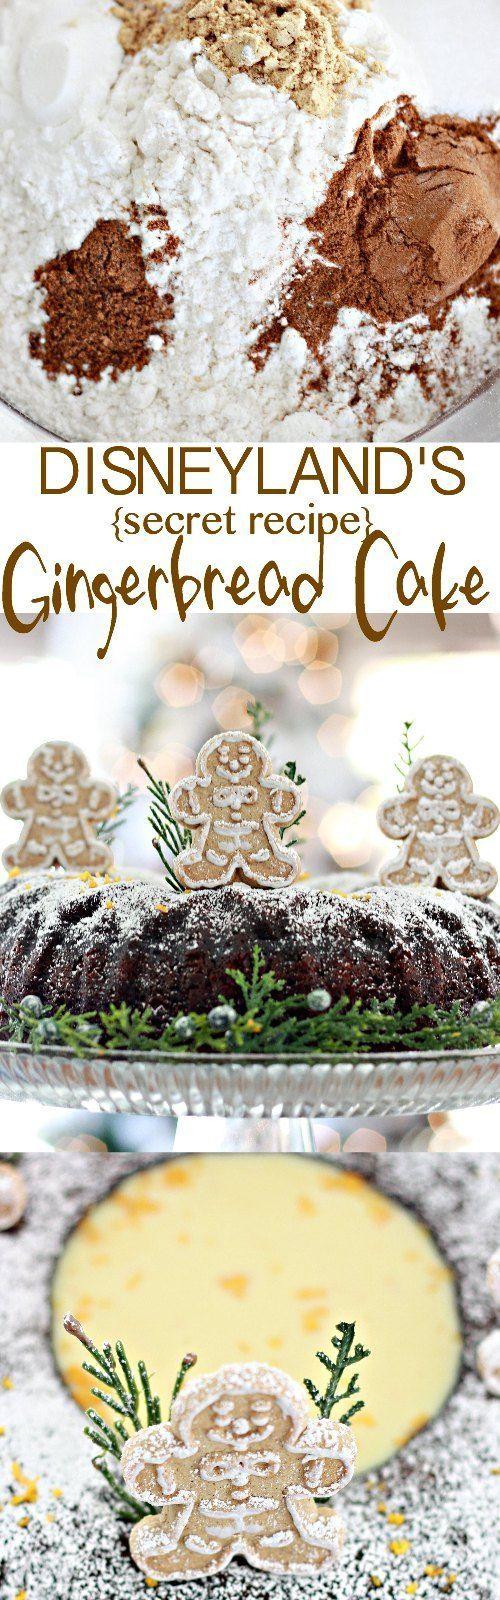 Disneyland's Gingerbread Cake with Orange Sauce Recipe